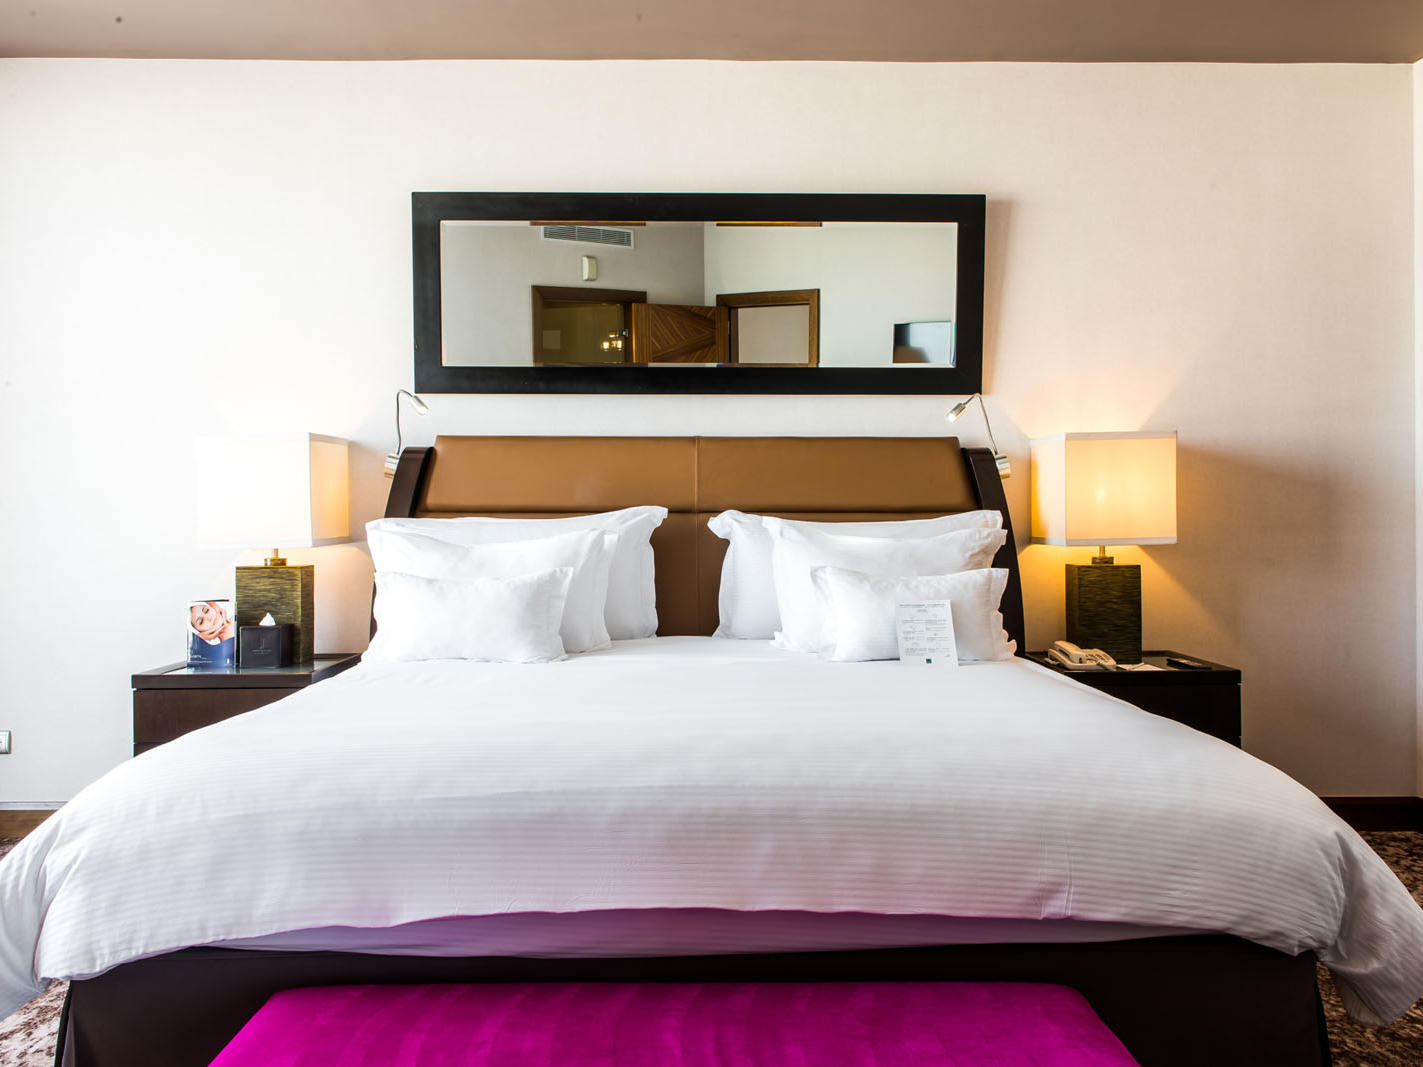 Premium Room at Kenzi Tower Hotel in Casablanca, Morocco